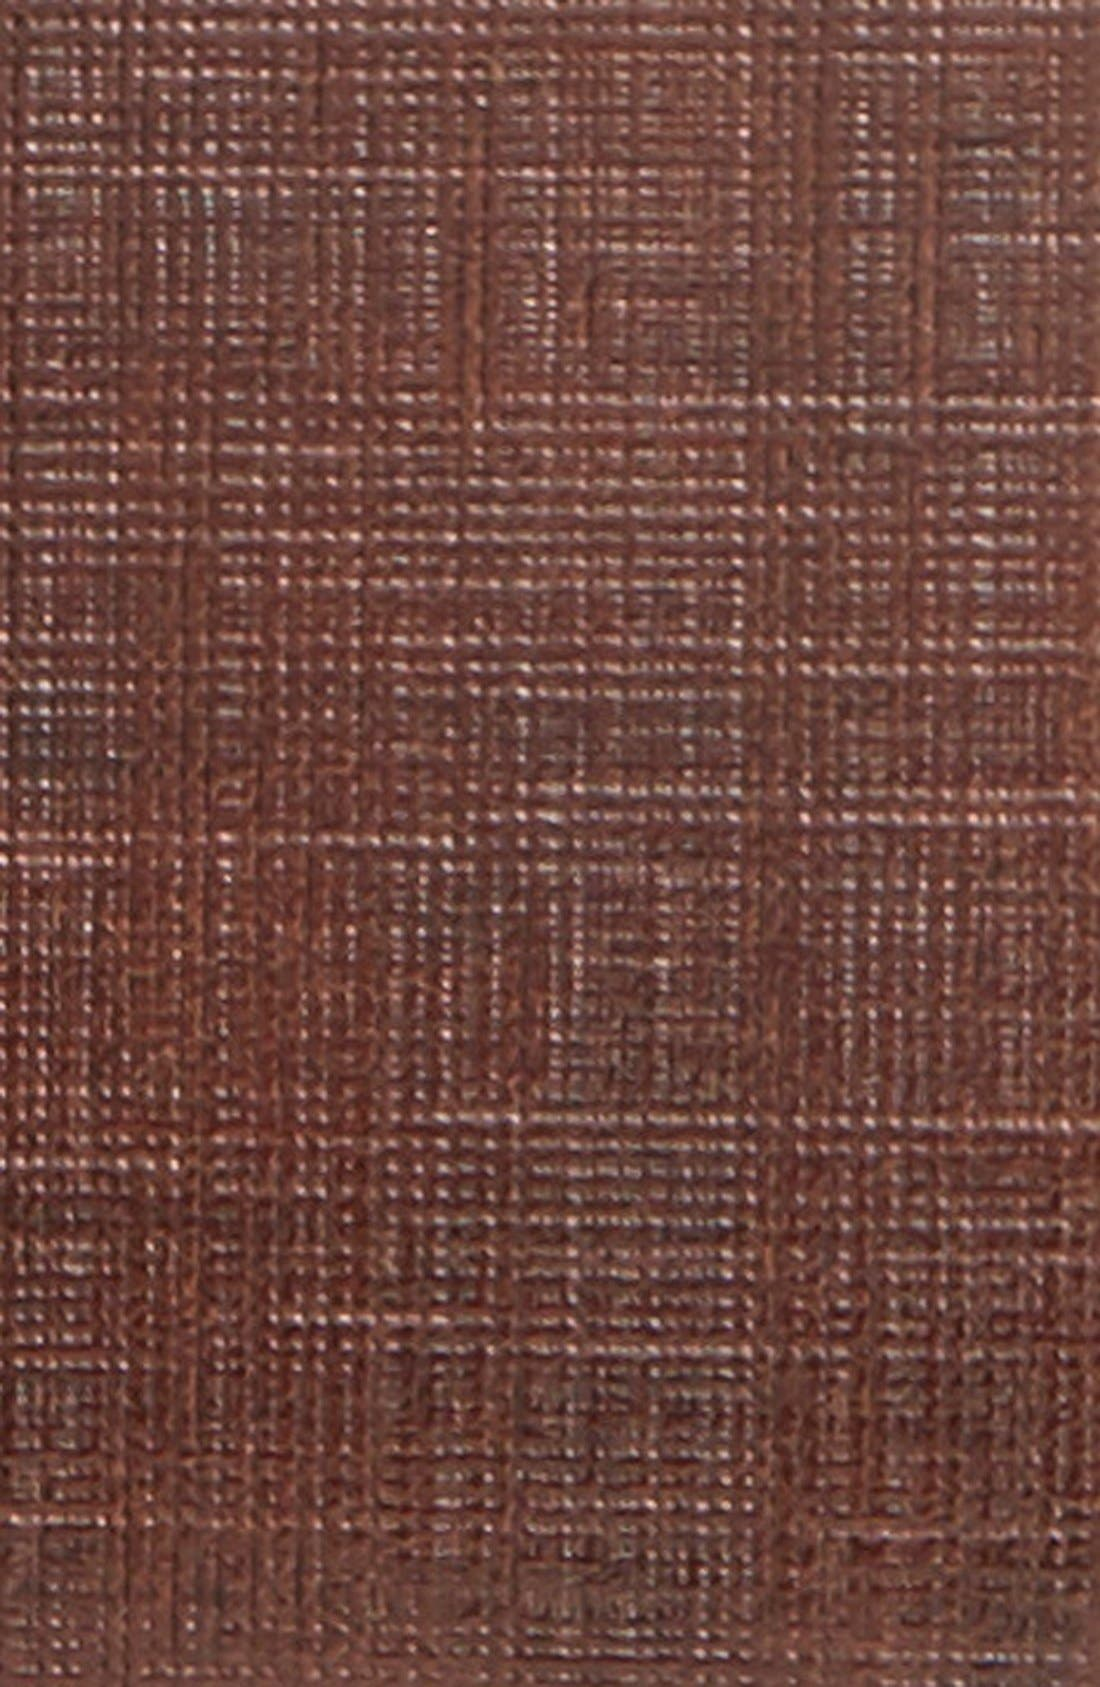 Alternate Image 2  - Trafalgar Leather Belt